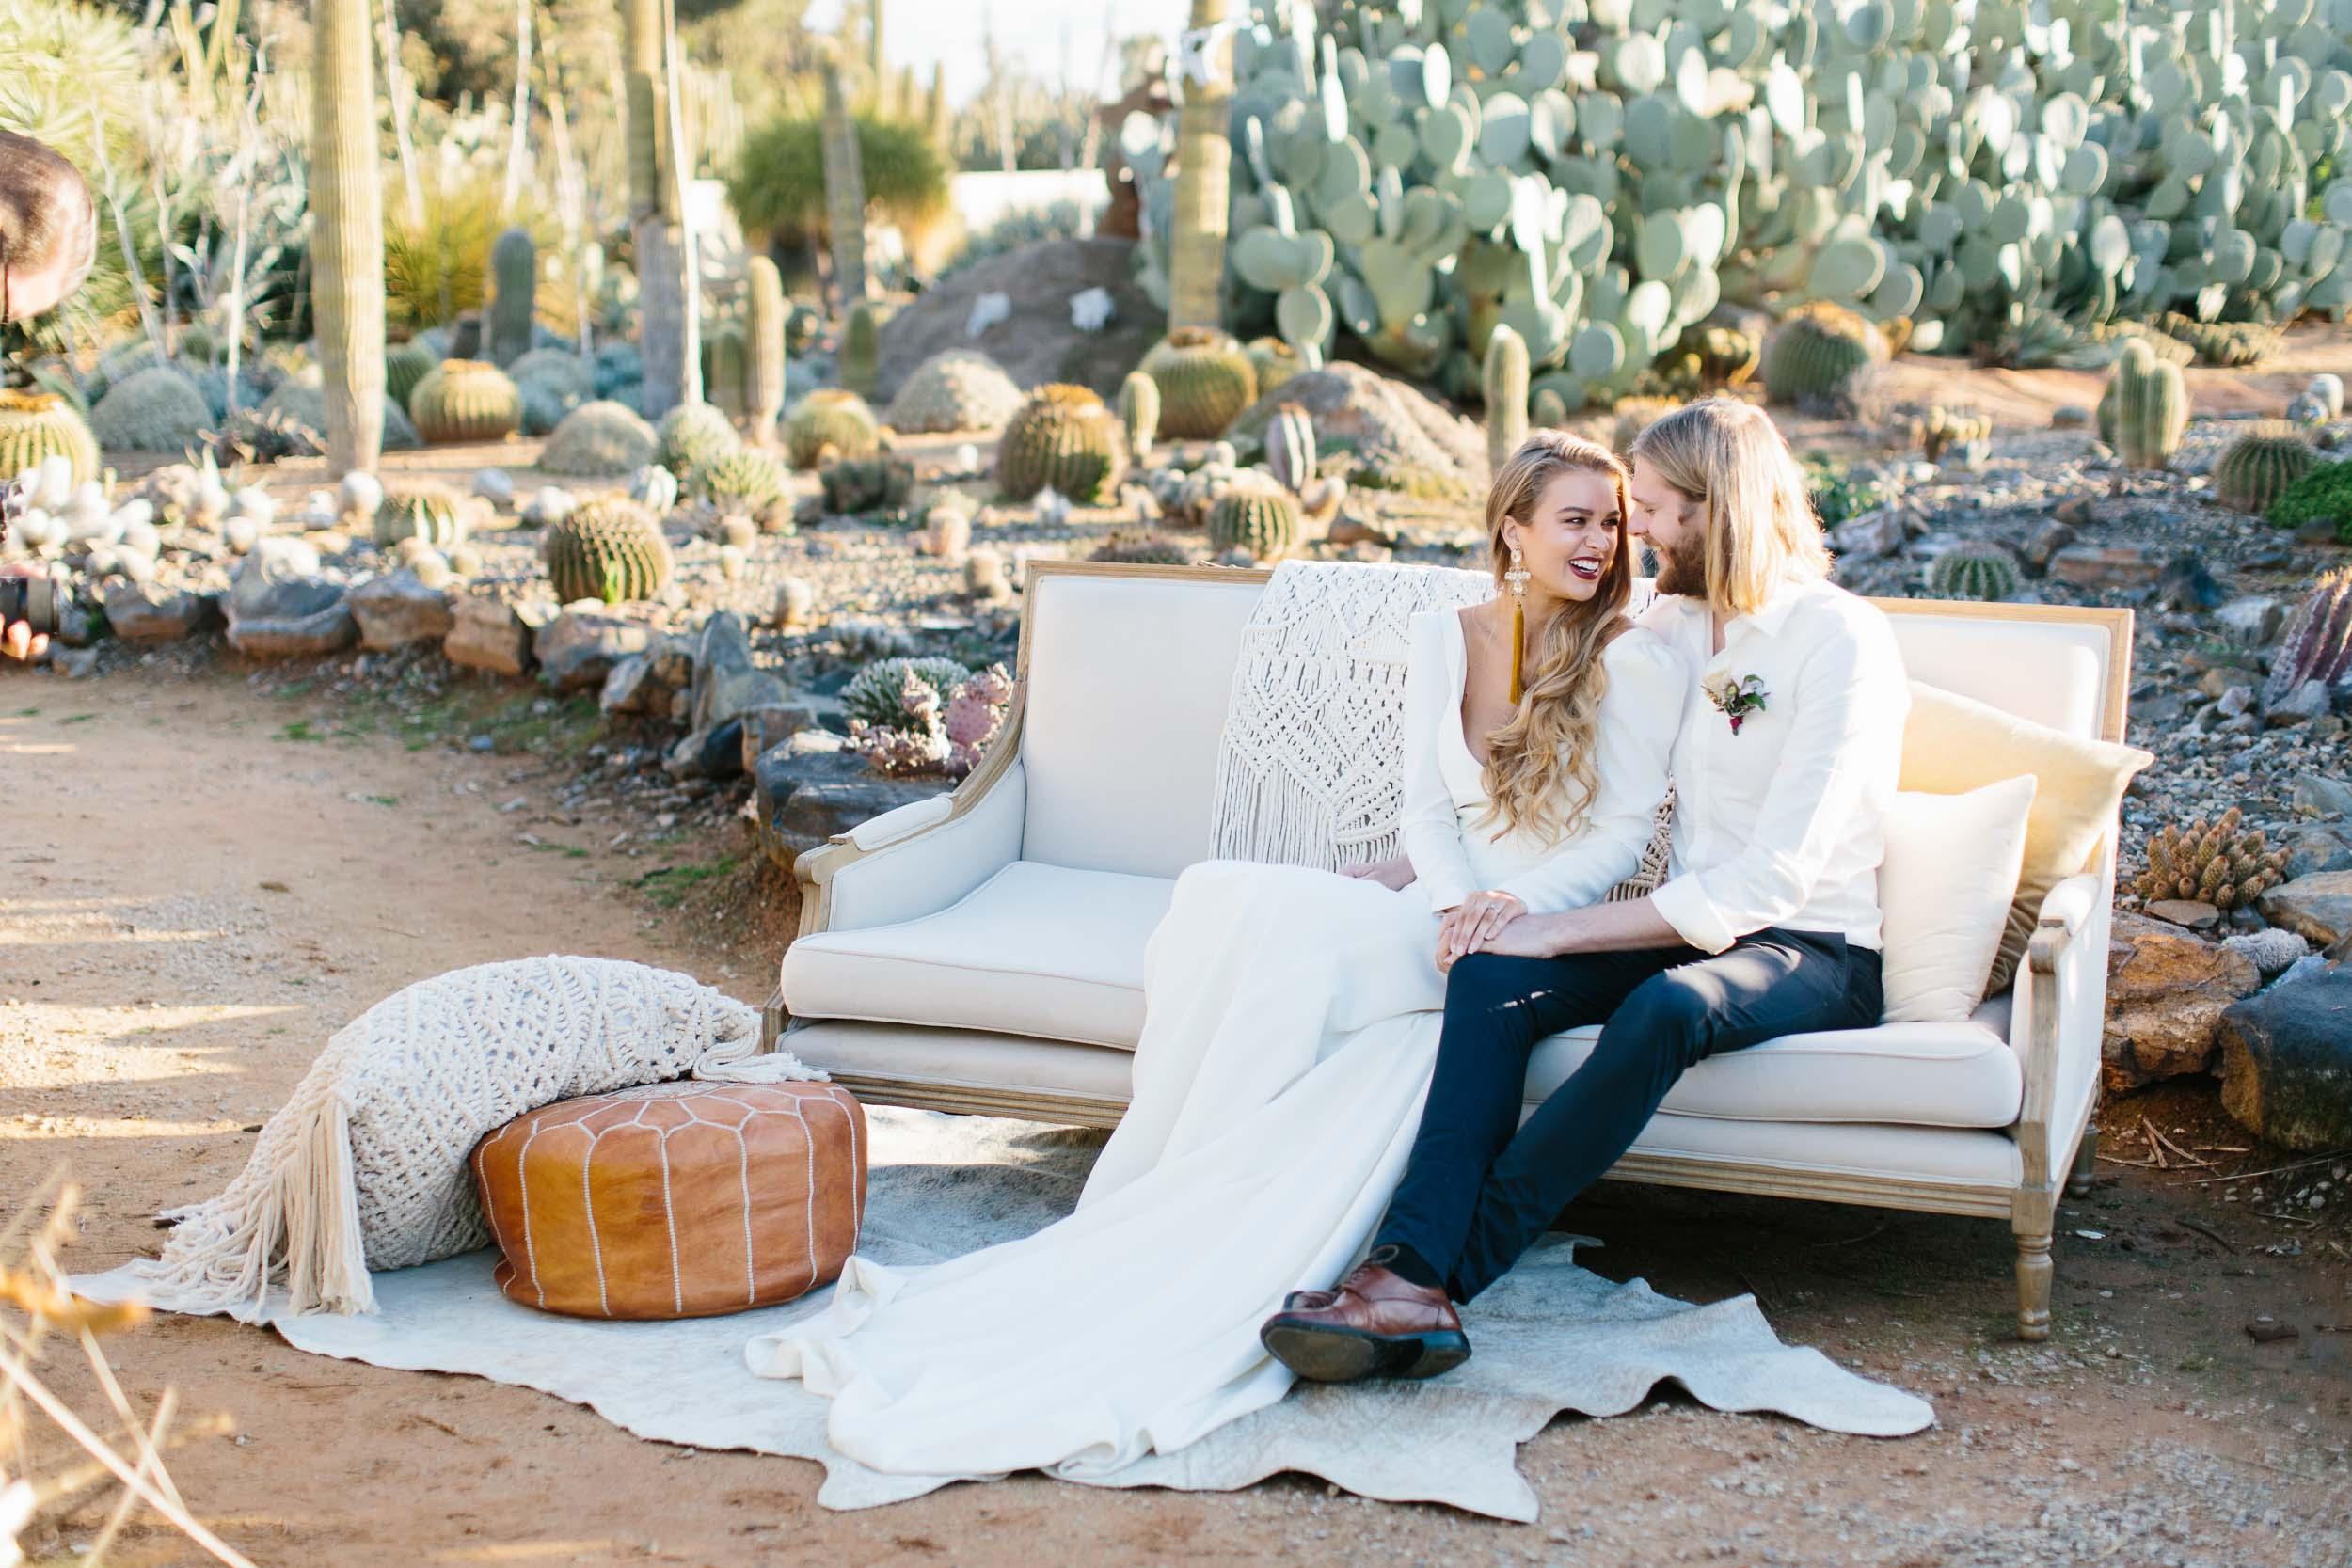 Kas-Richards-Ruby-and-James-Stylist-Cactus-Country-Karen-Willis-Holmes-Bridal-One-Heart-Studios-Boho-Wedding-63.jpg